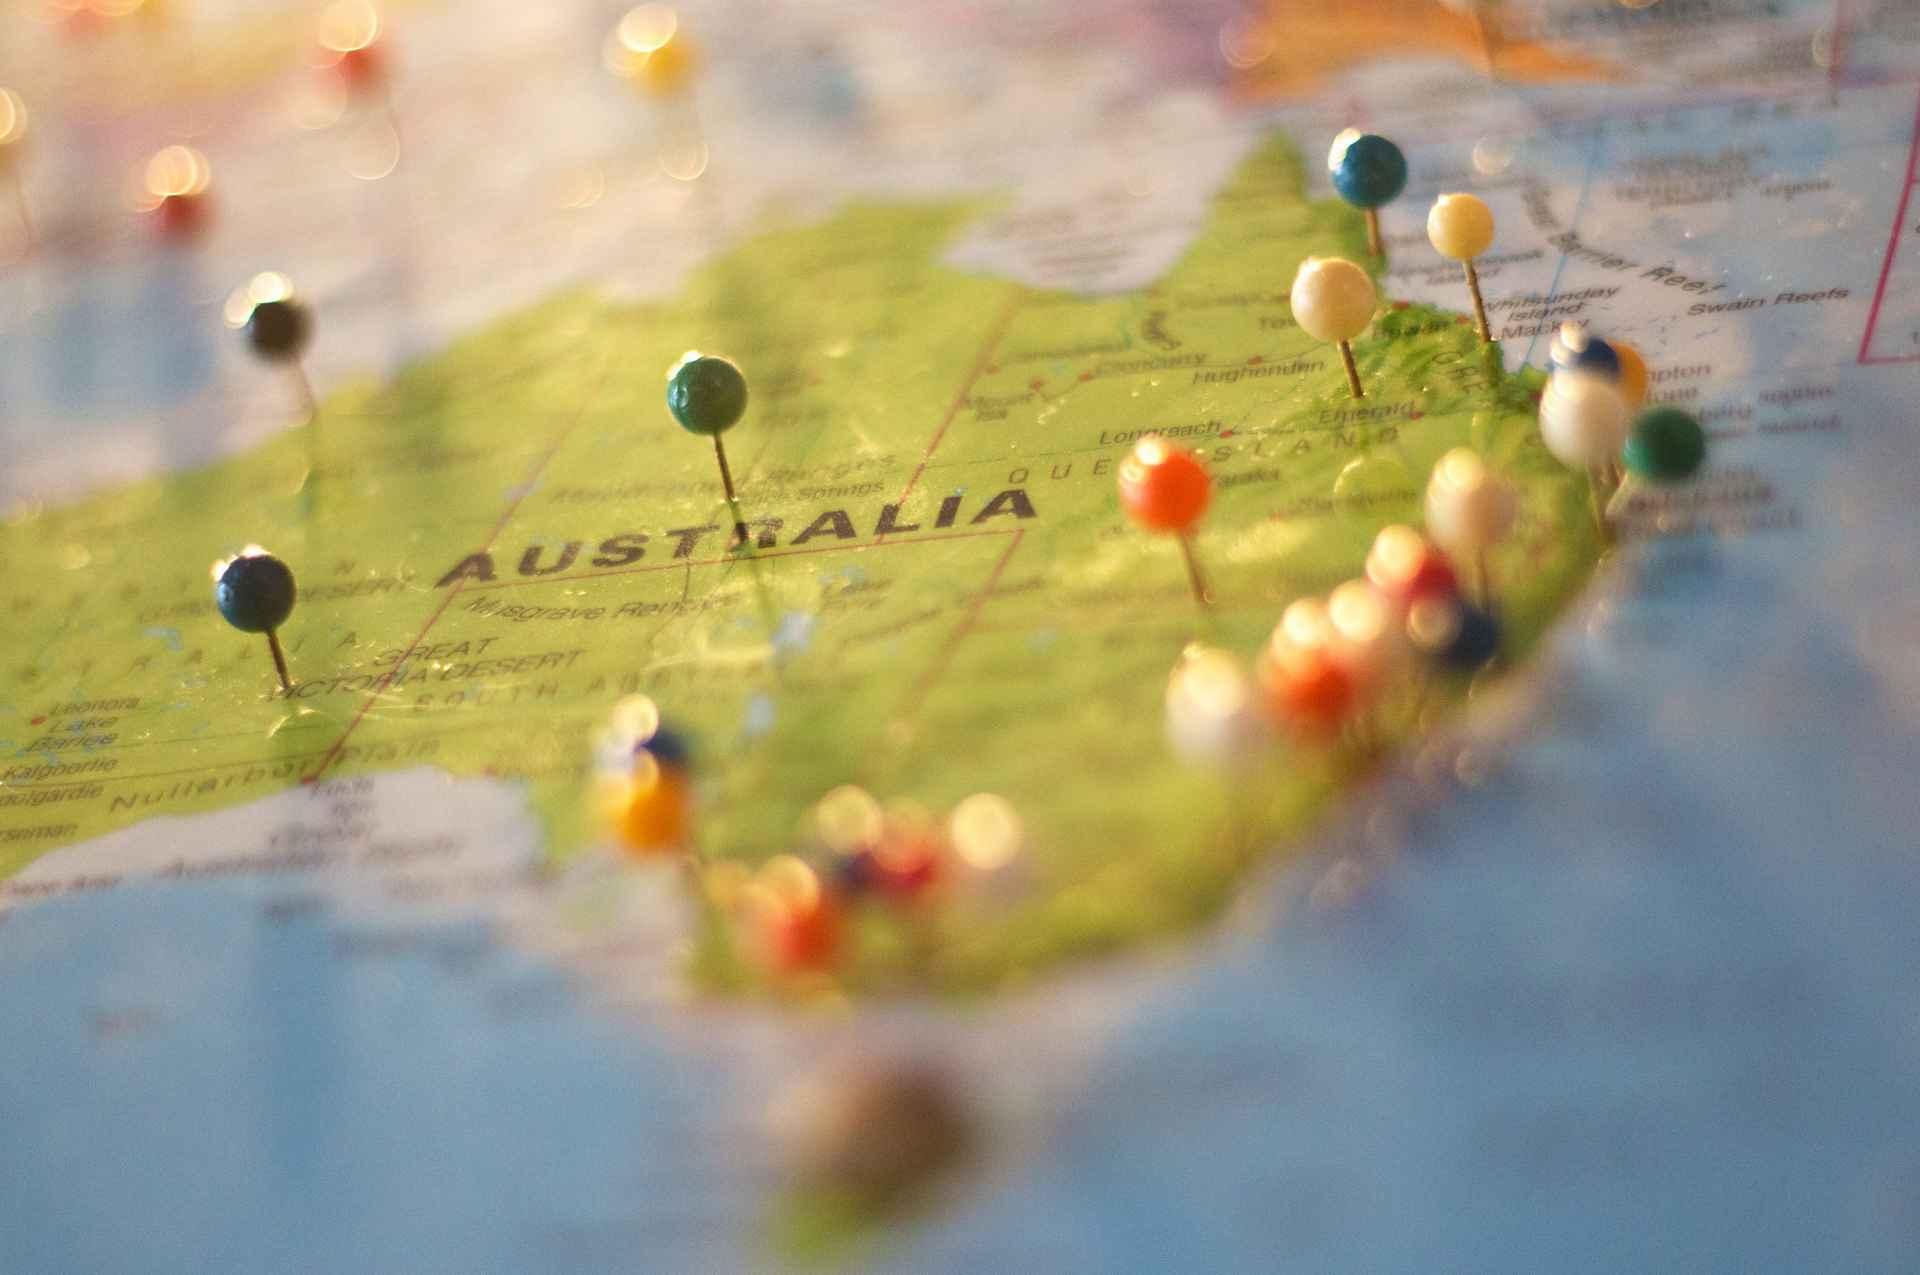 MyCRA (Specialist Credit Repair) Lawyers Australia | 1300 667 218